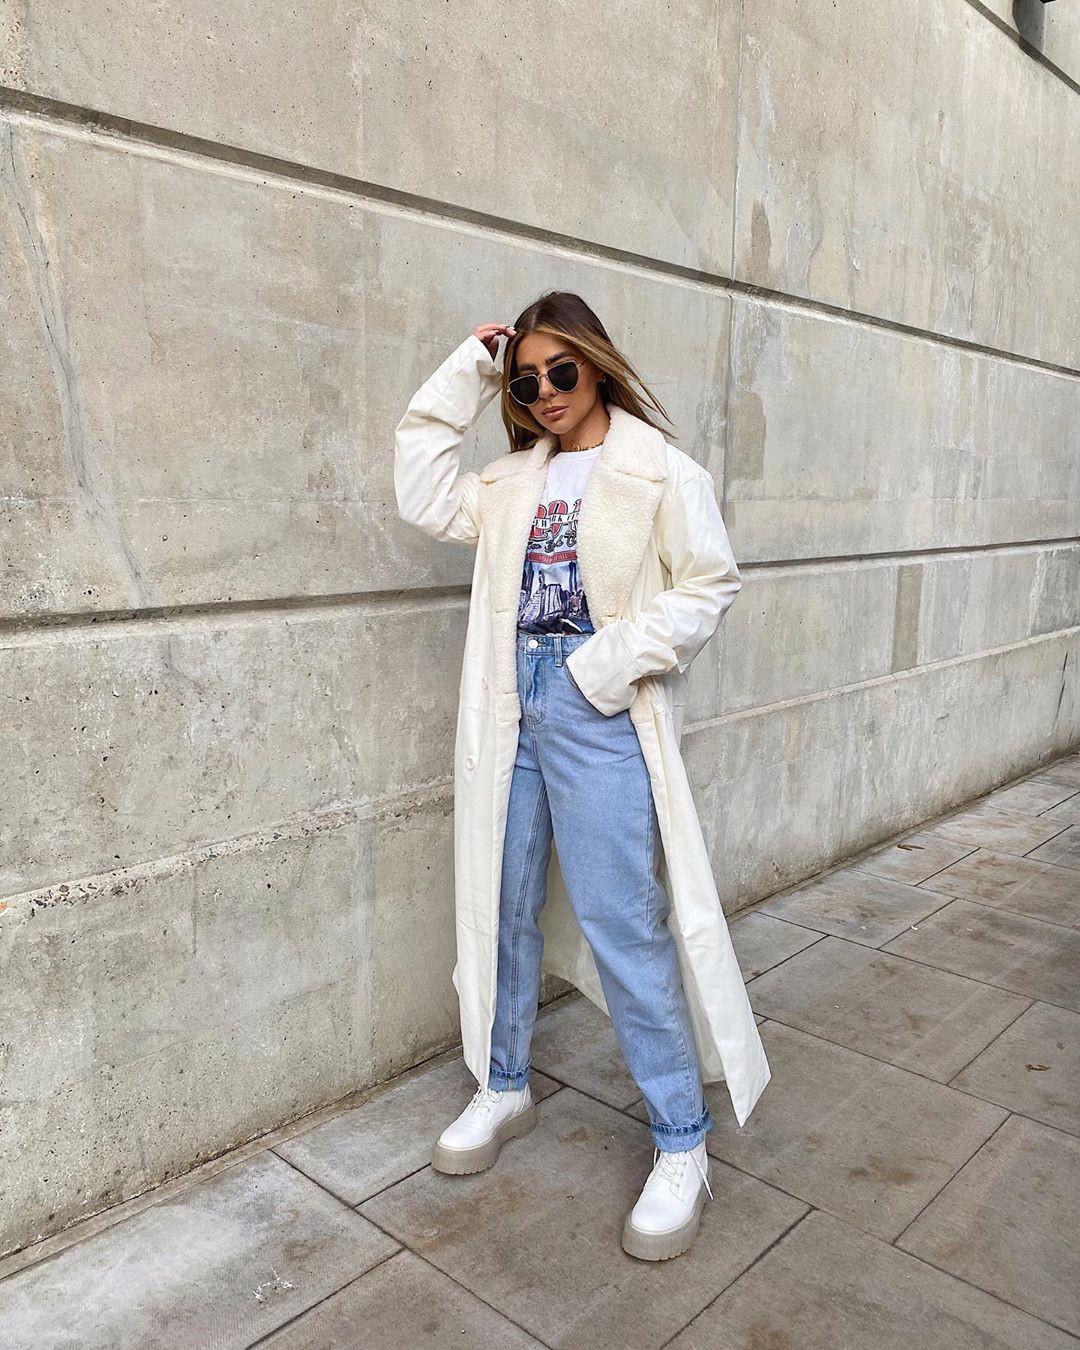 White and blue denim, jeans, girls instagram photos